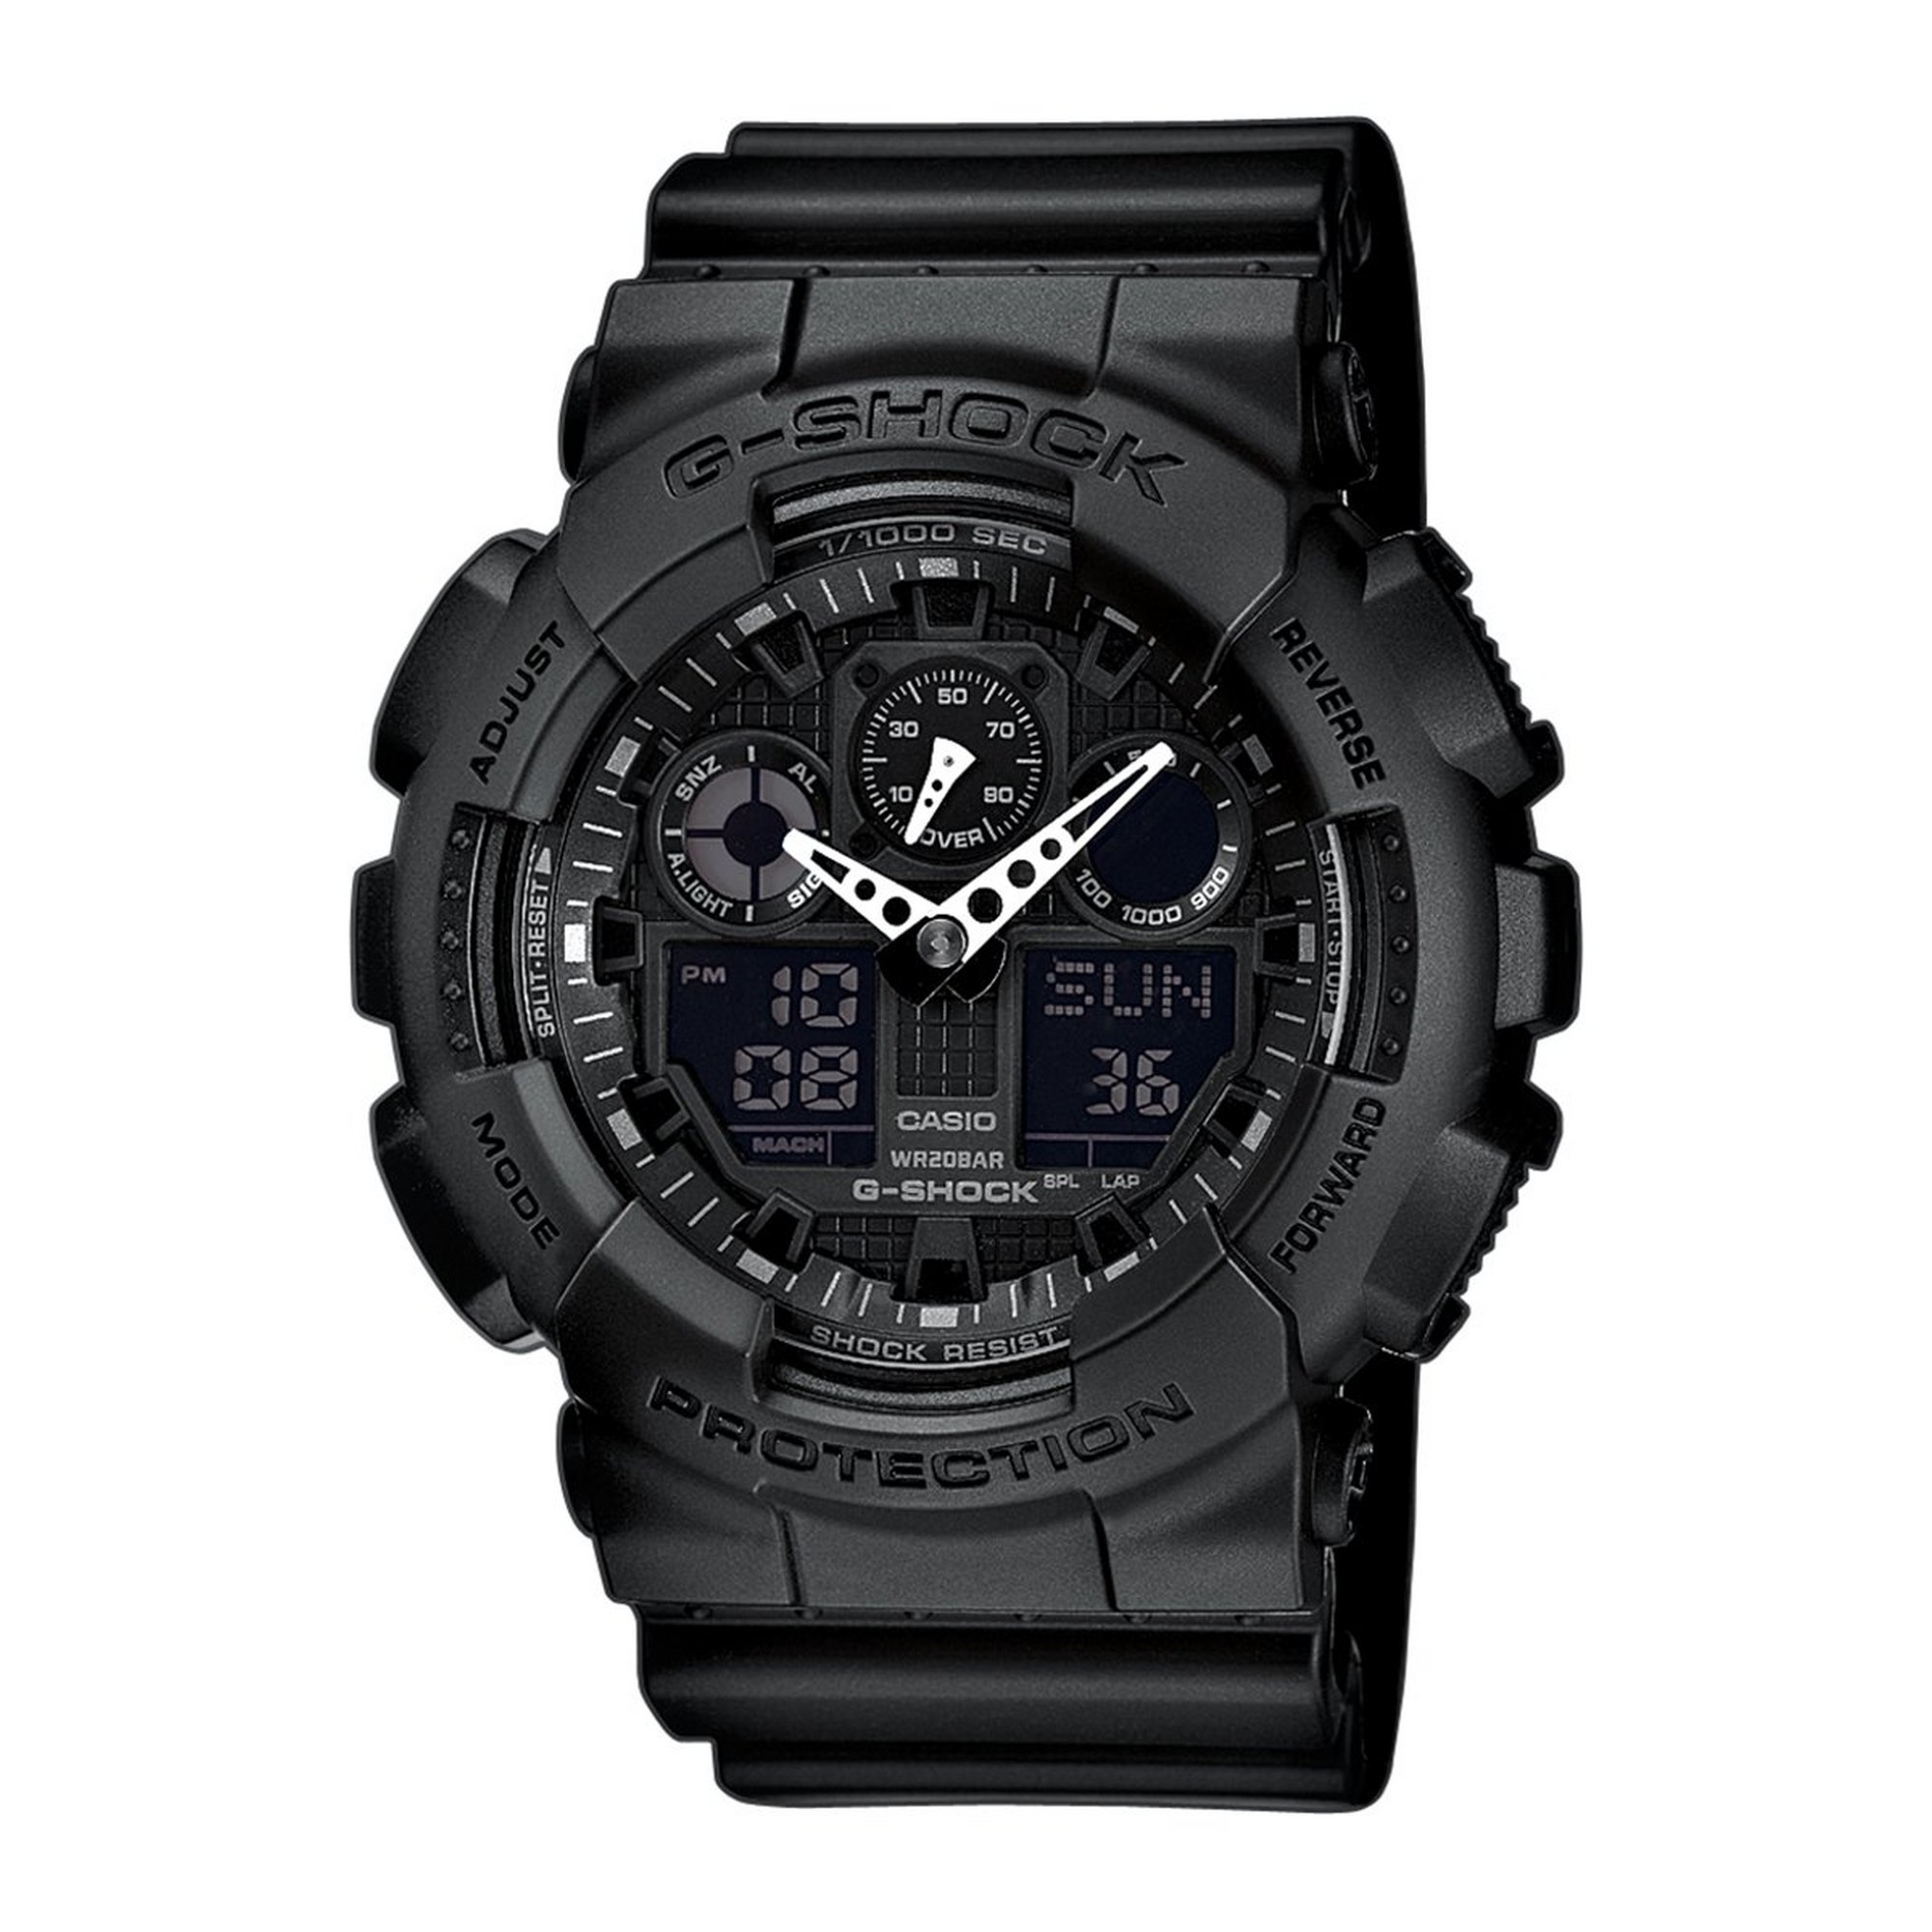 Image of Casio G-Shock Alarm Watch